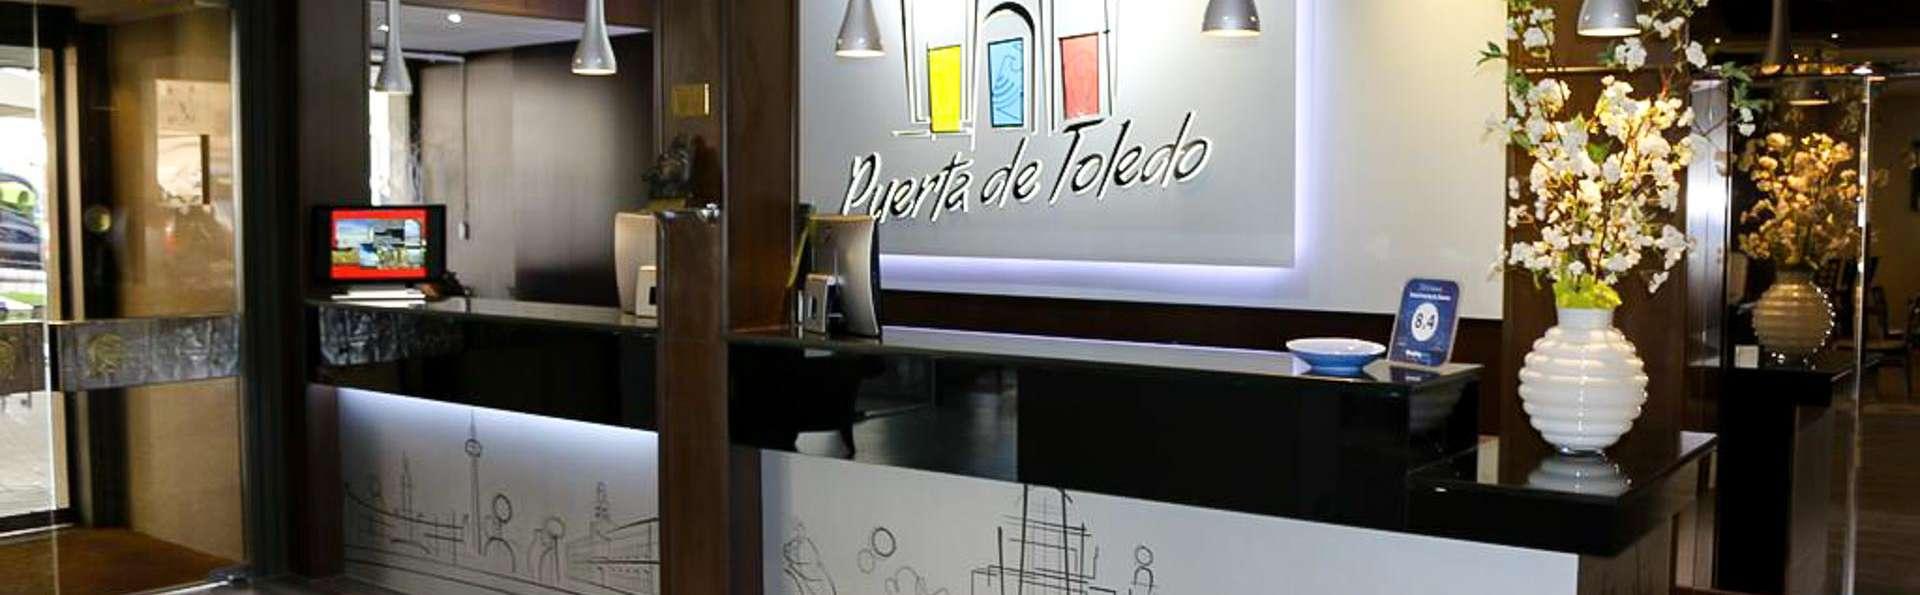 Hotel Puerta de Toledo - EDIT_LOBBY_01.jpg